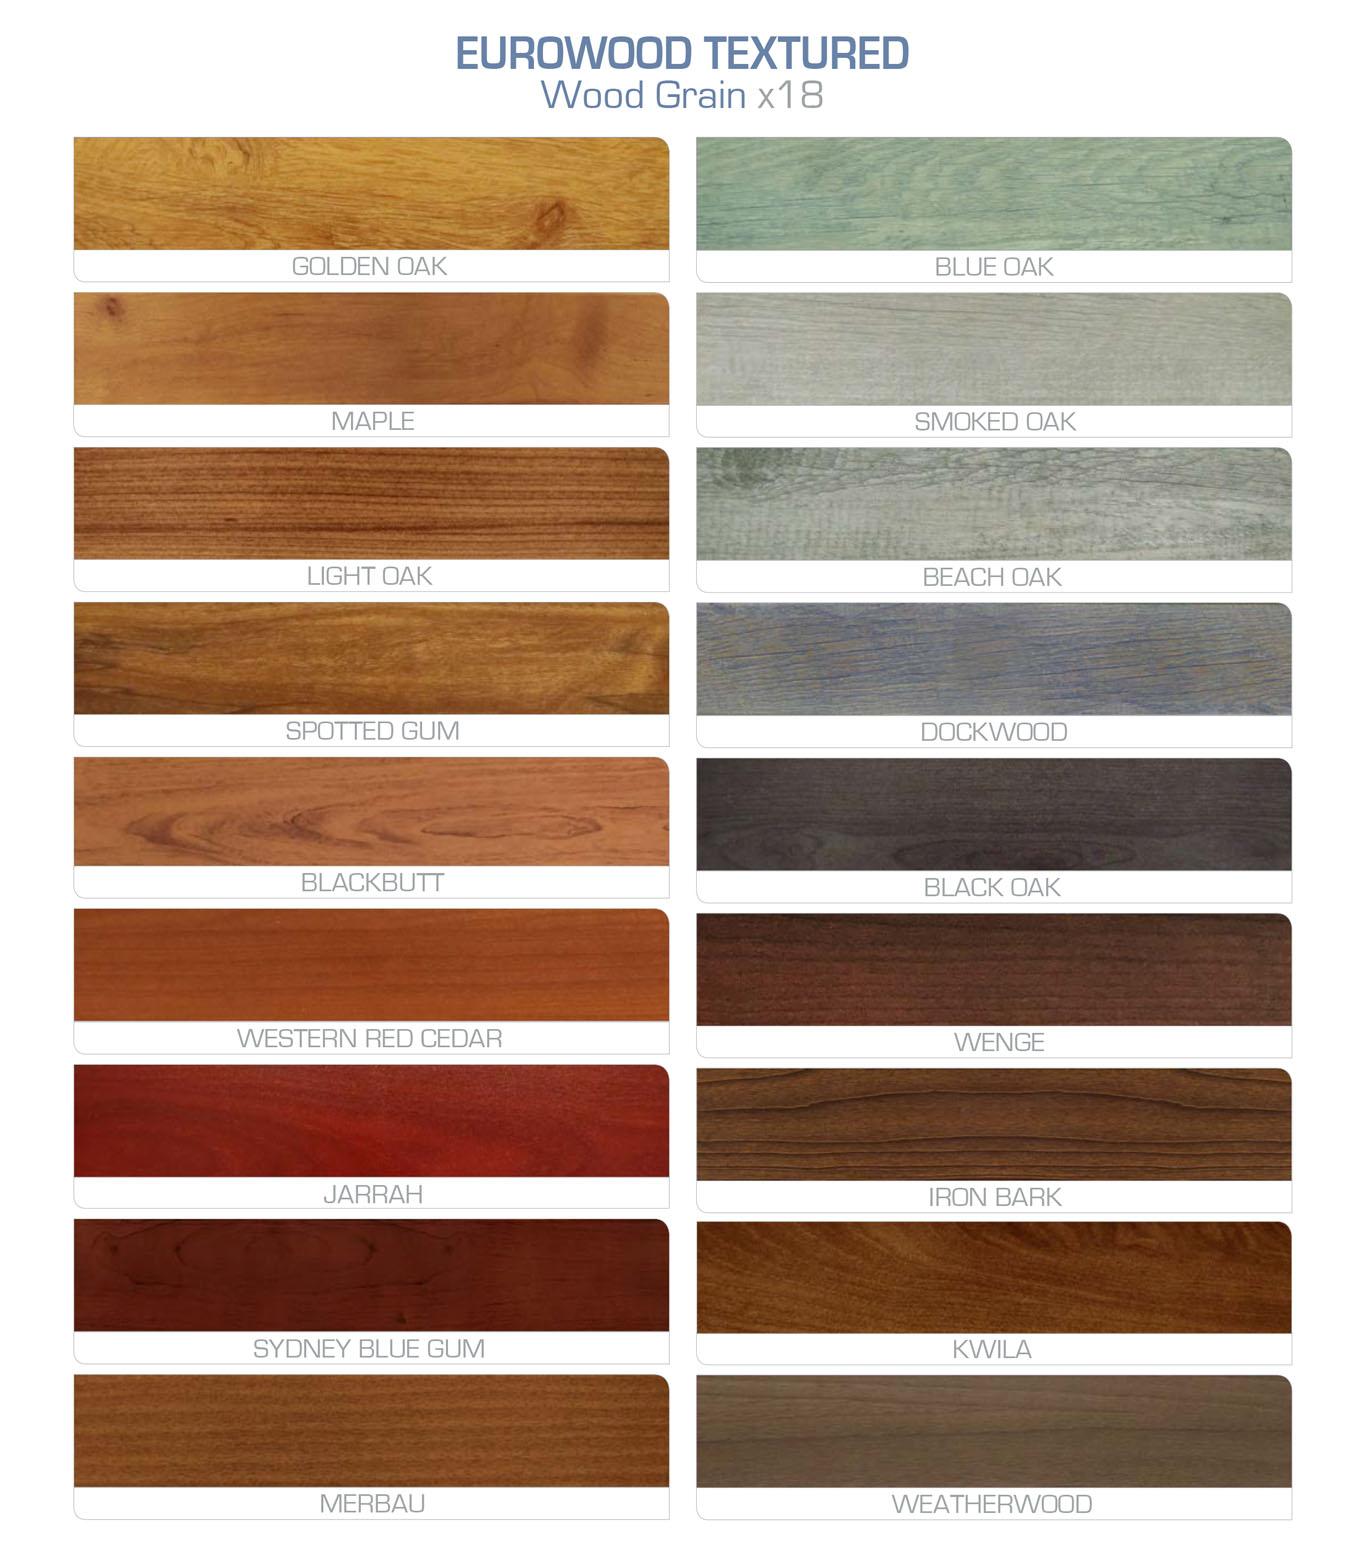 textured wood grain full